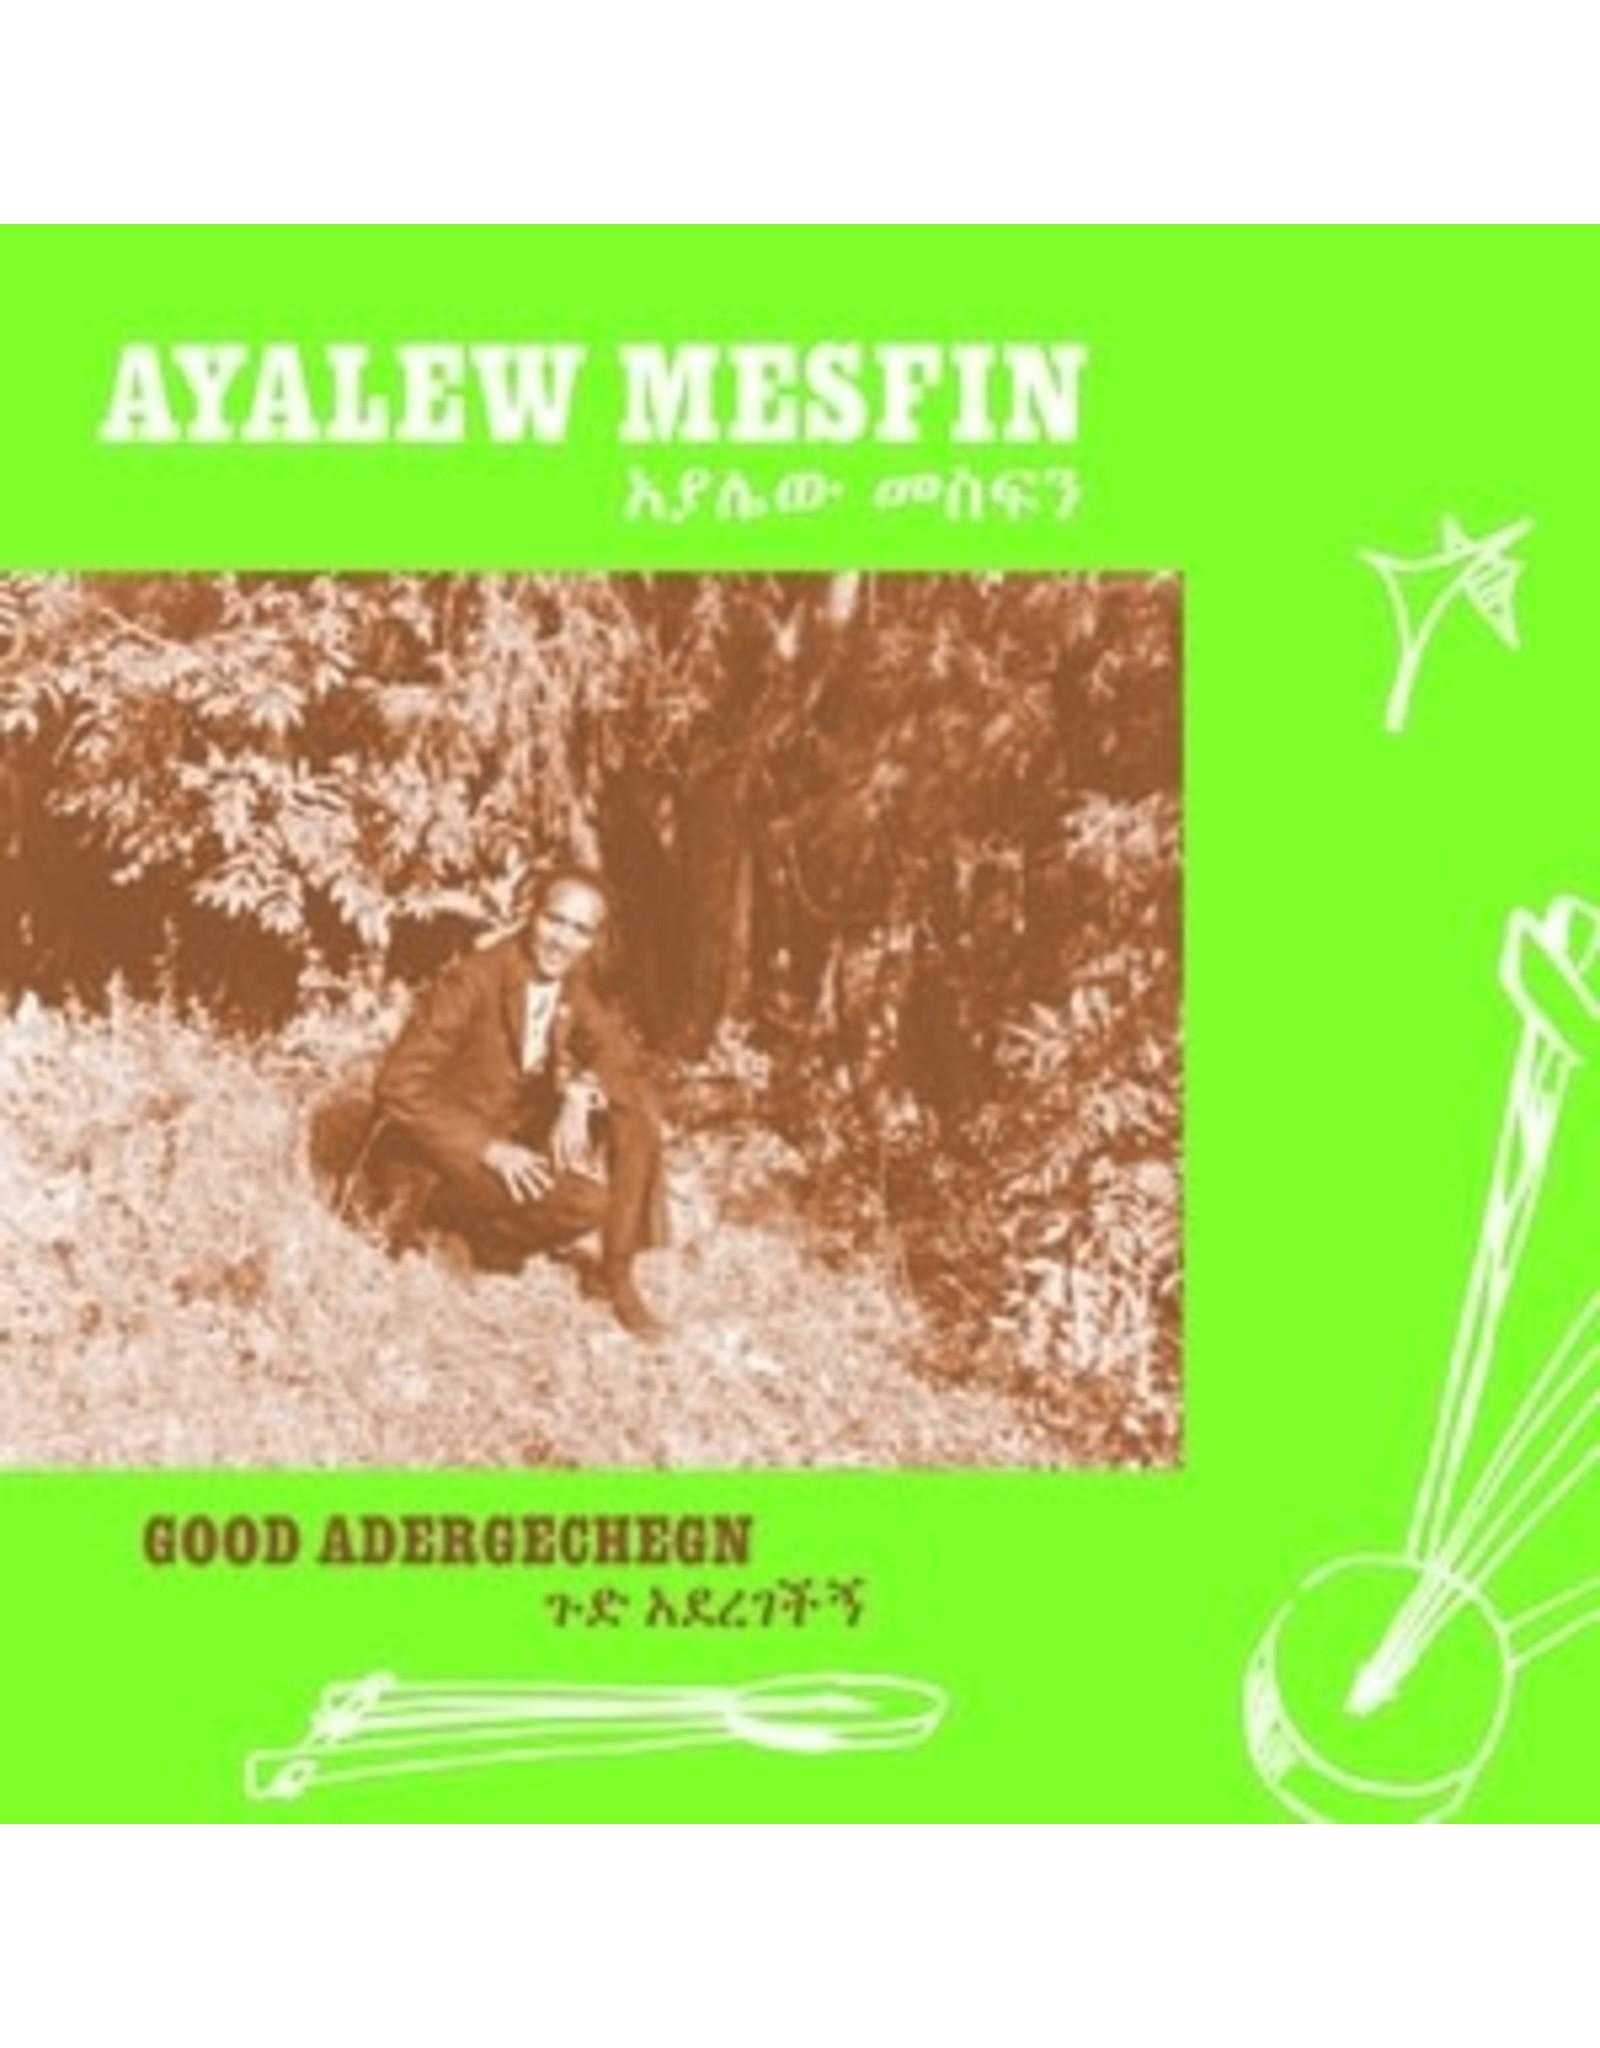 New Vinyl Ayalew Mesfin - Good Adergechegn LP